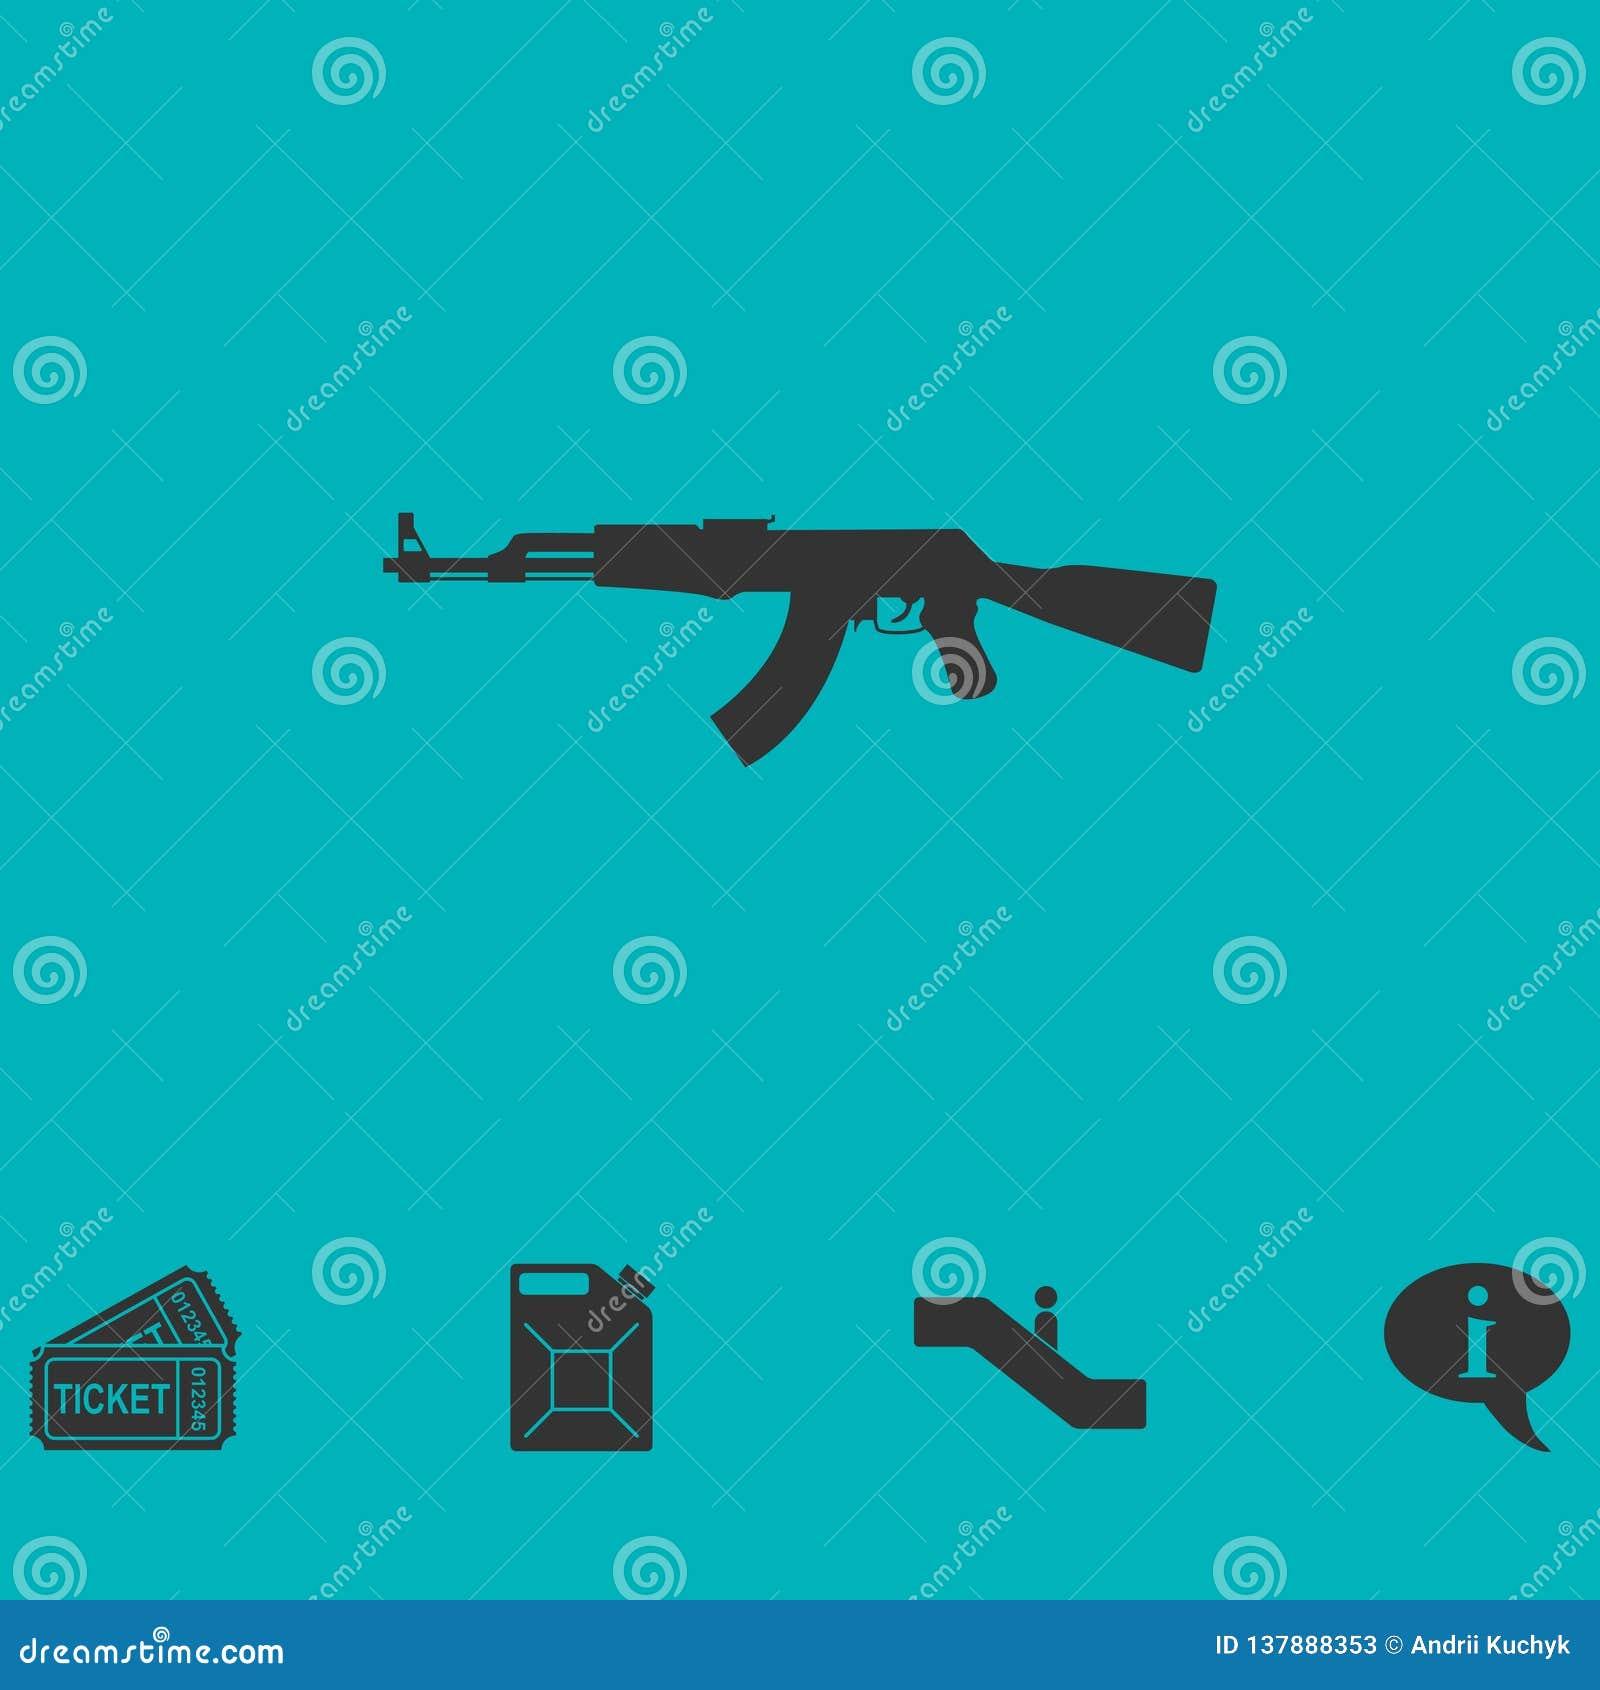 Assault rifle icon flat